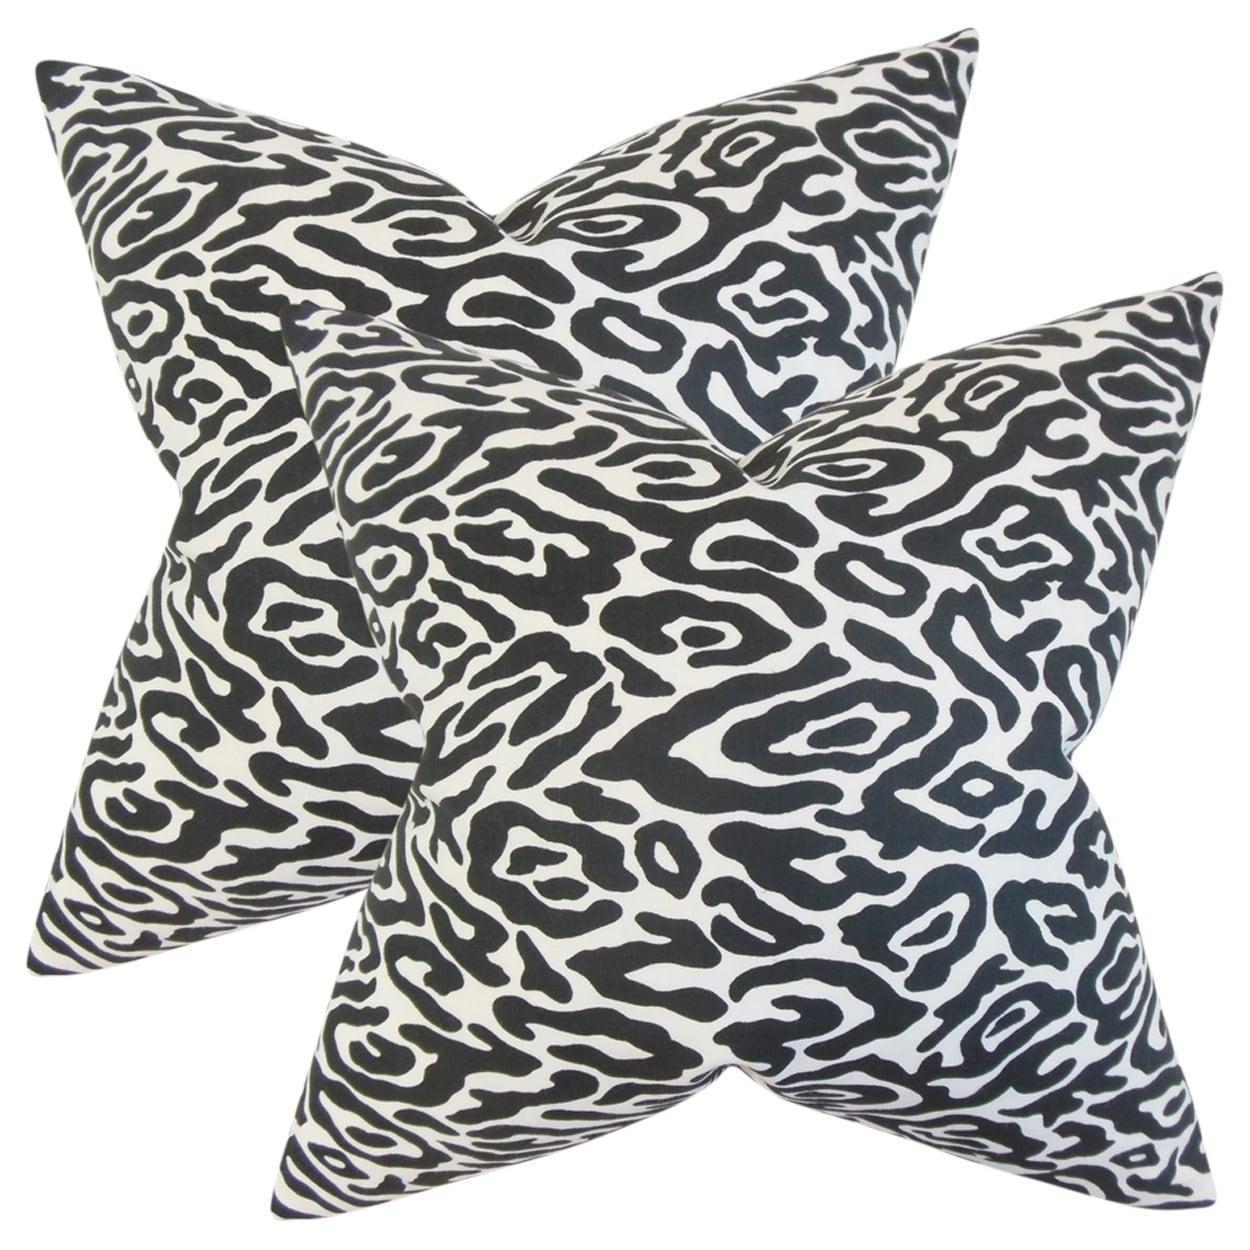 Set Of 2 Bevin Geometric Throw Pillows In Black White